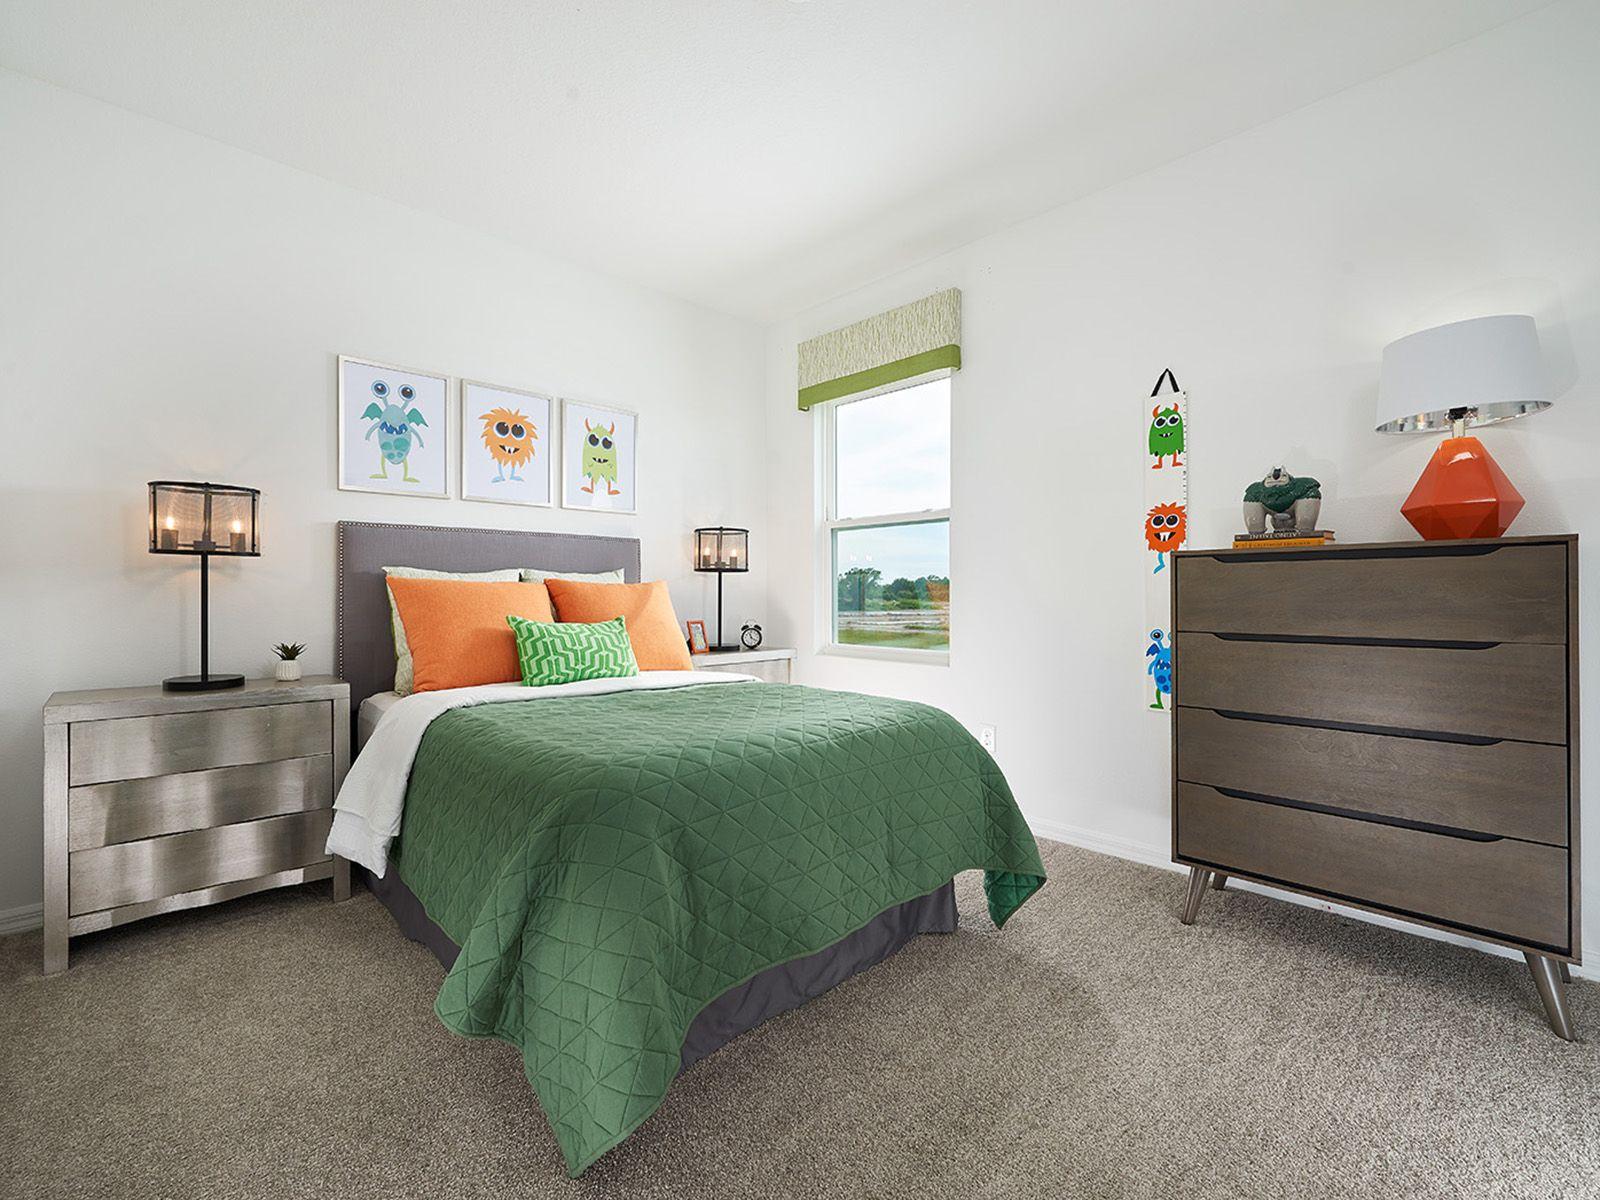 Bedroom featured in the Juniper By Meritage Homes in Tampa-St. Petersburg, FL